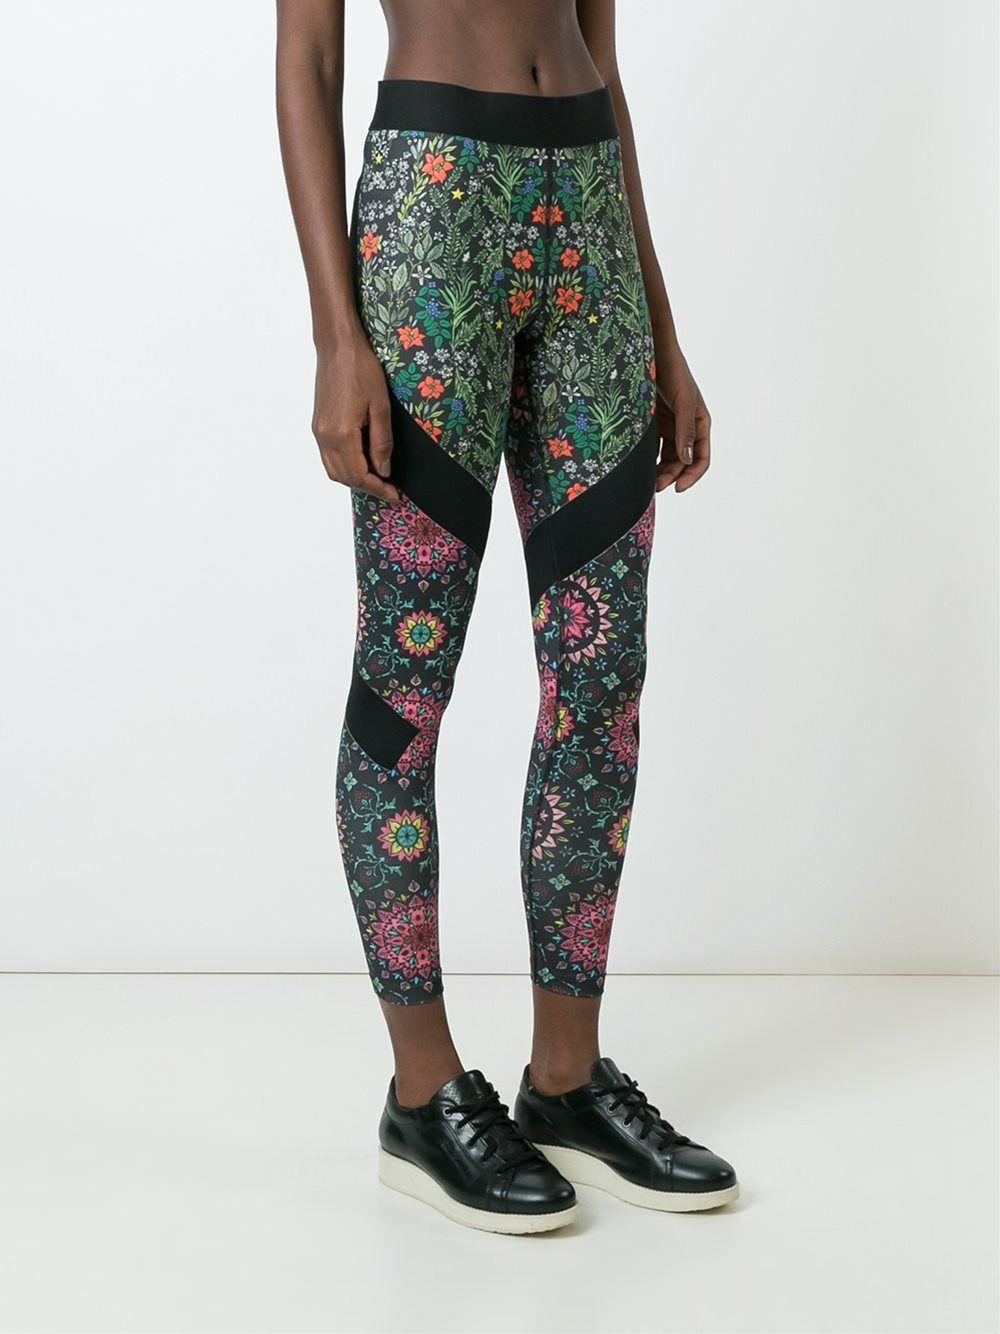 Nike NikeLab x RT floral leggings  84e555970